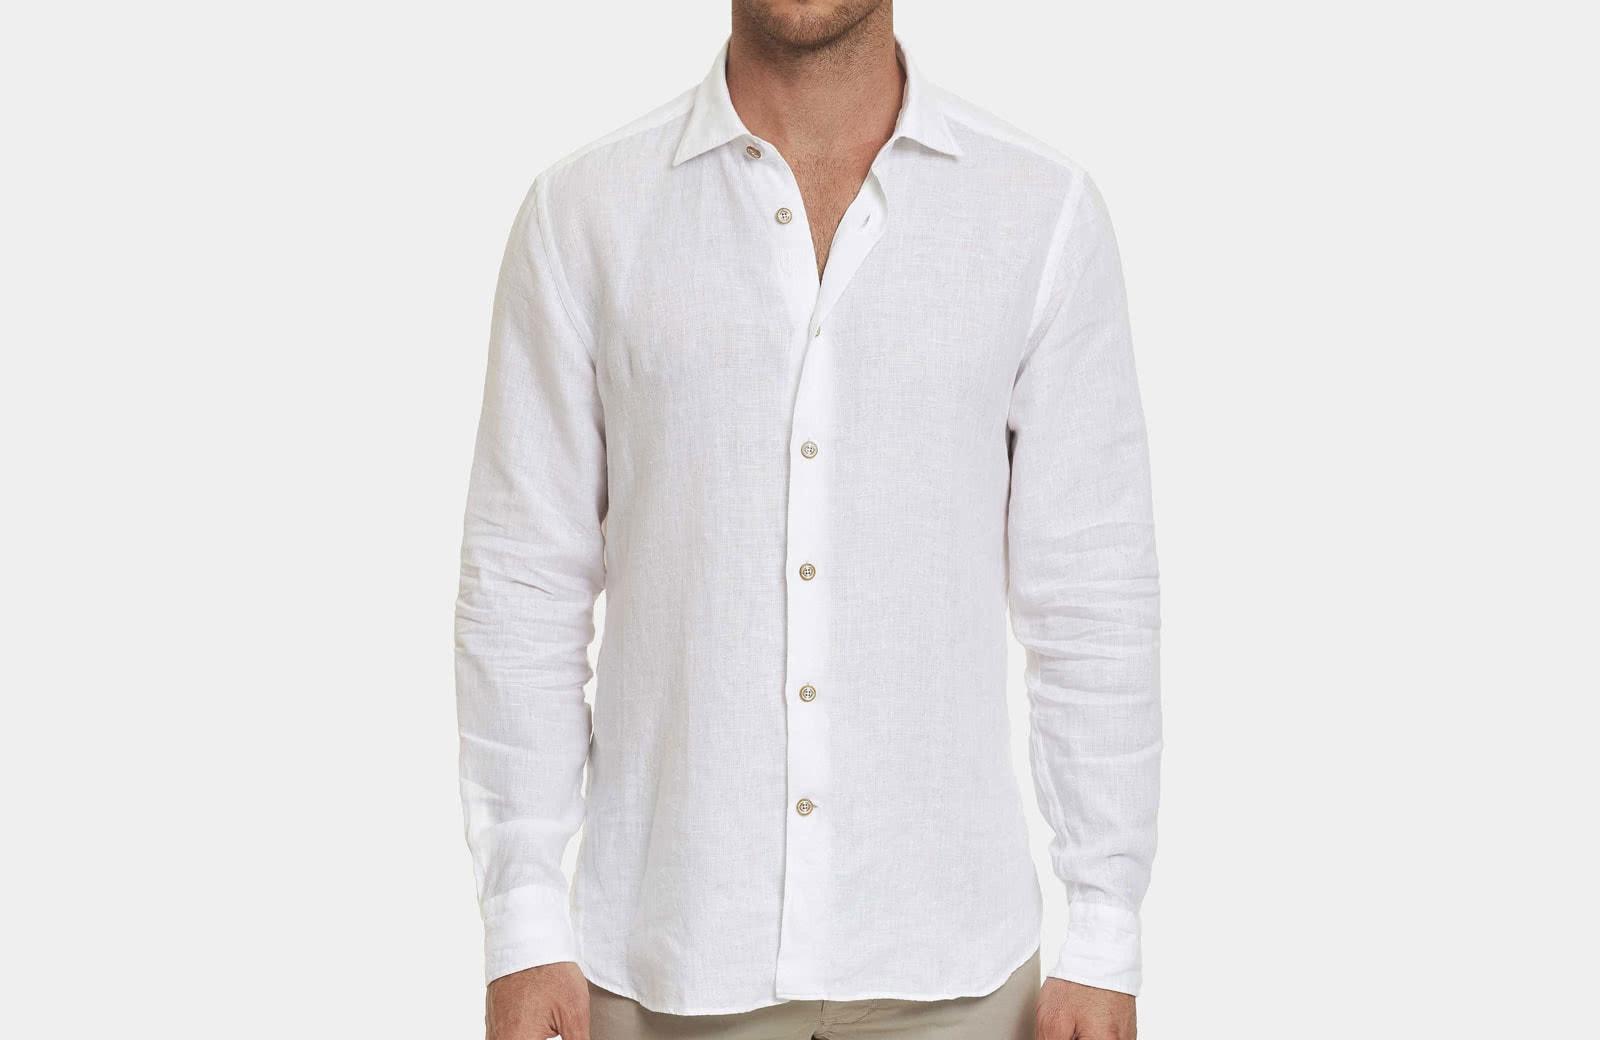 15 Best Men Designer Shirts From Robert Graham (2019 Updated)